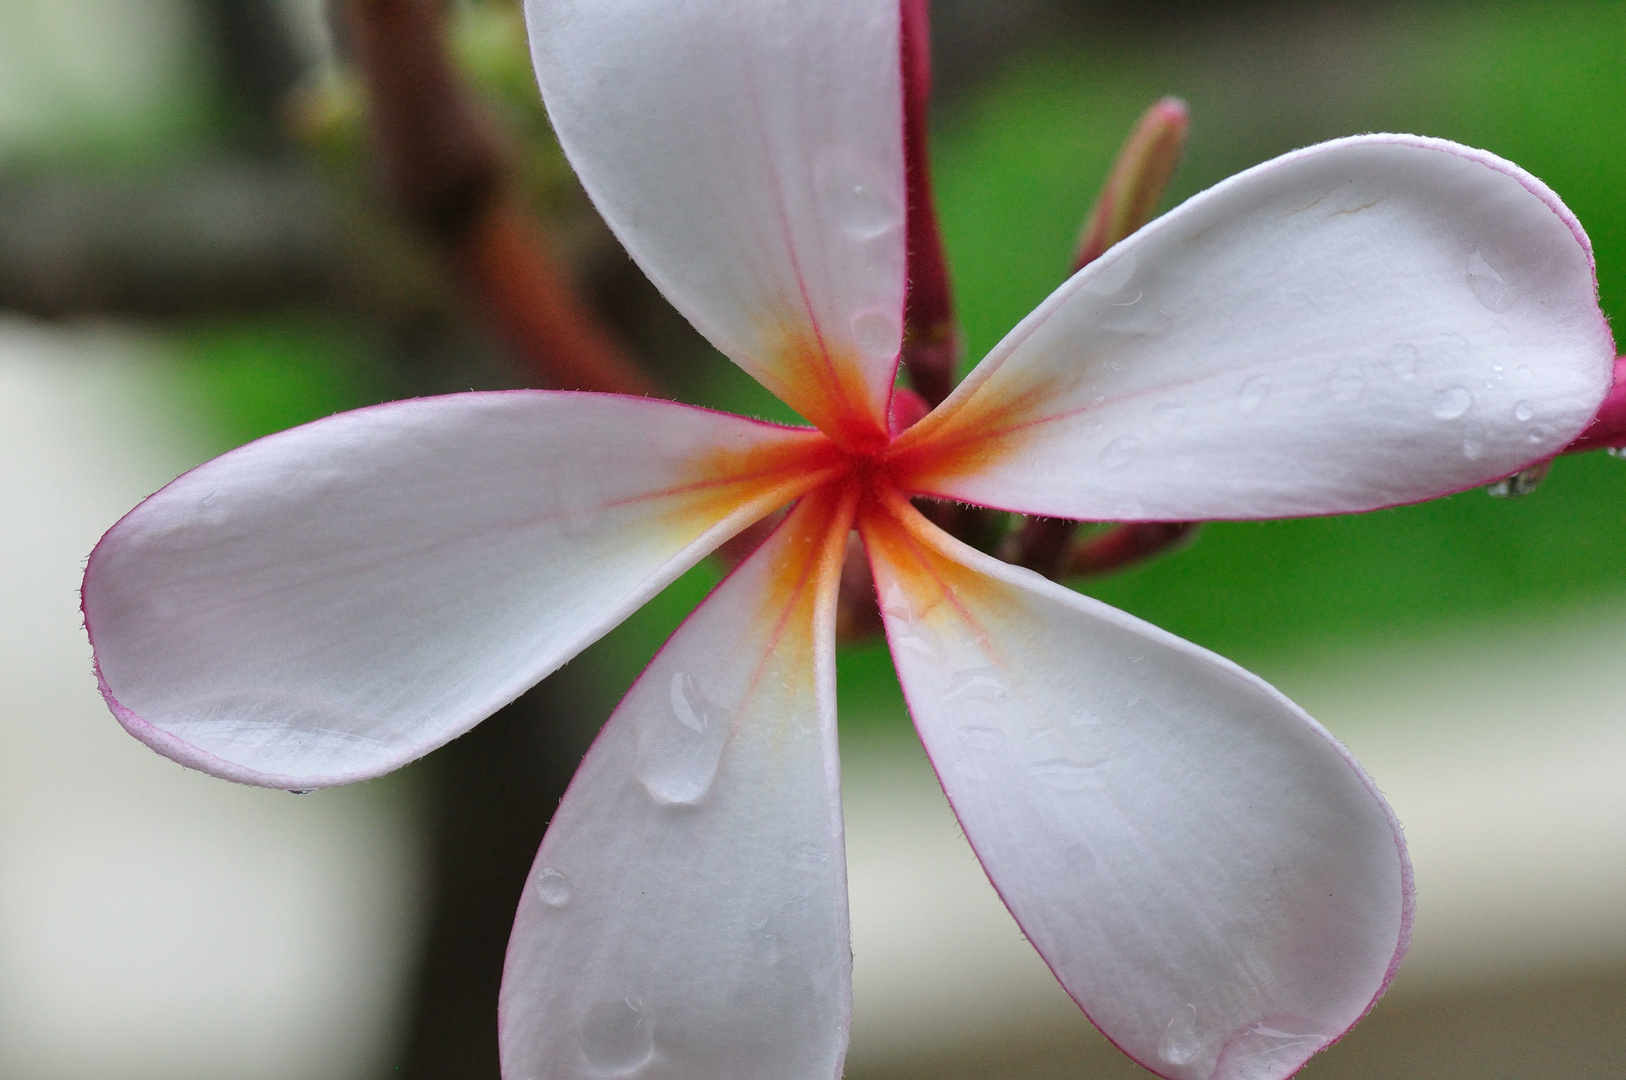 raindrops on magnolia blossom